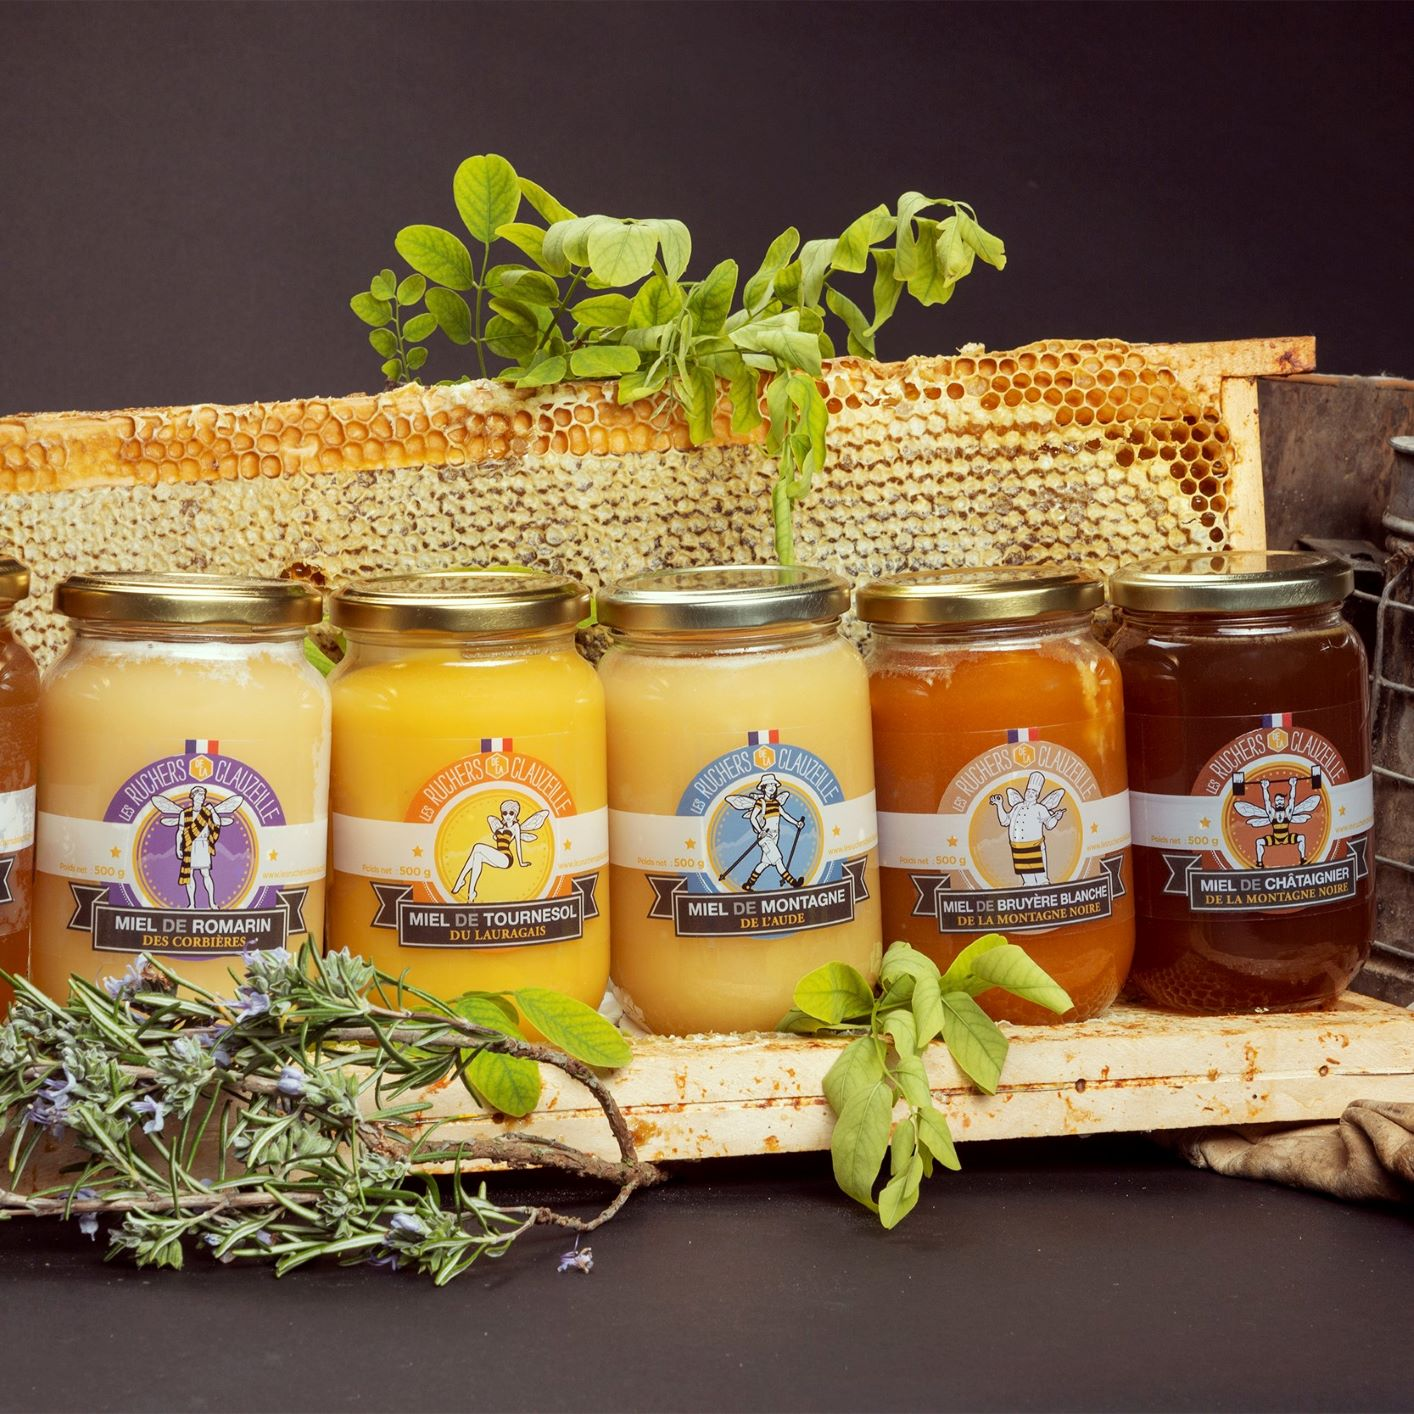 miel occitanie acacia romarin tournesol garrigue bruyère montagne vertus bienfaits toux